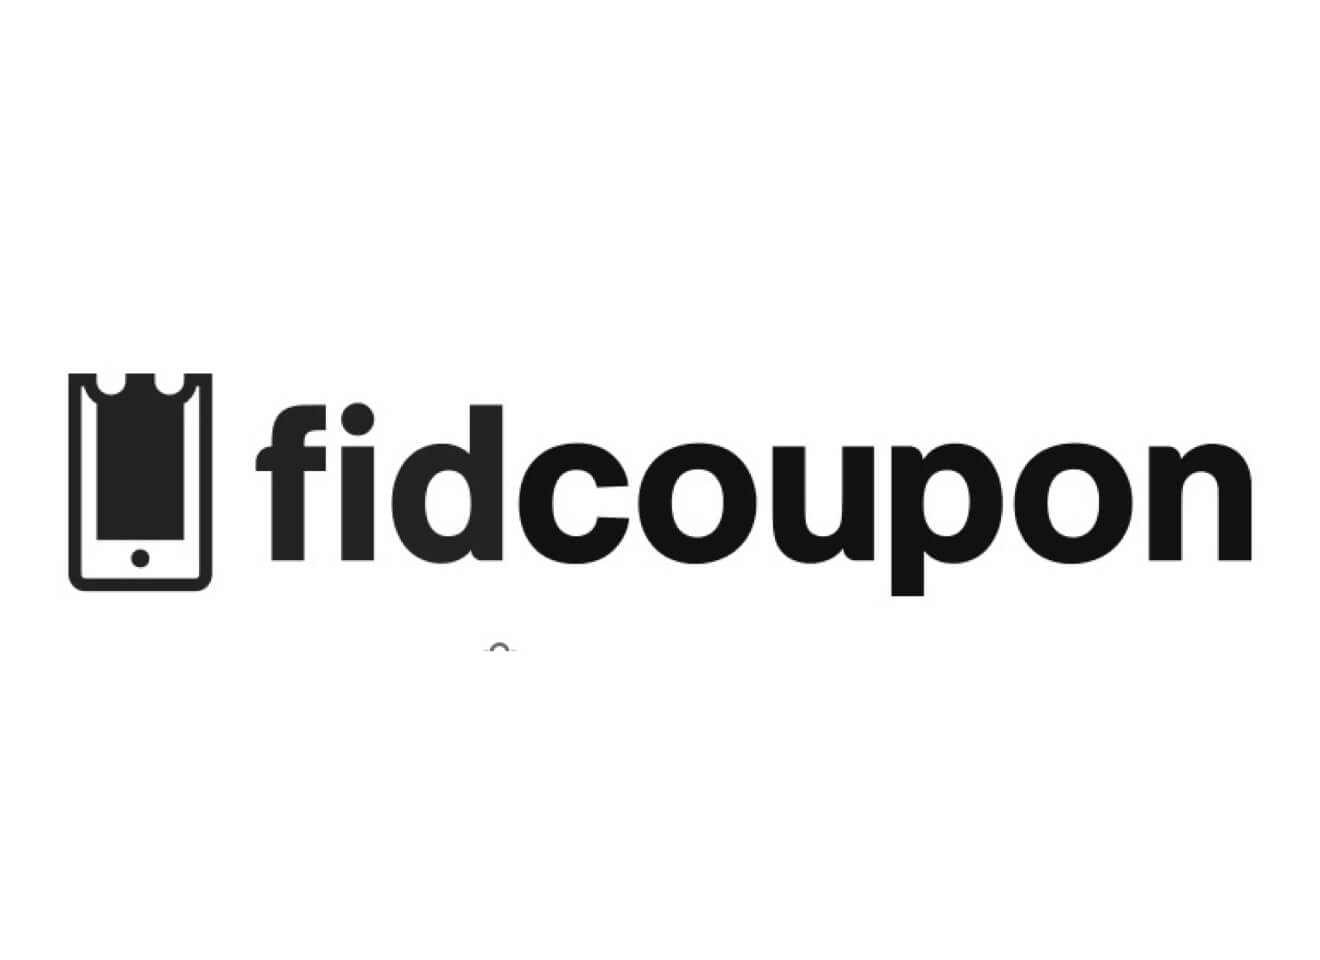 branding-logo-fidcoupon